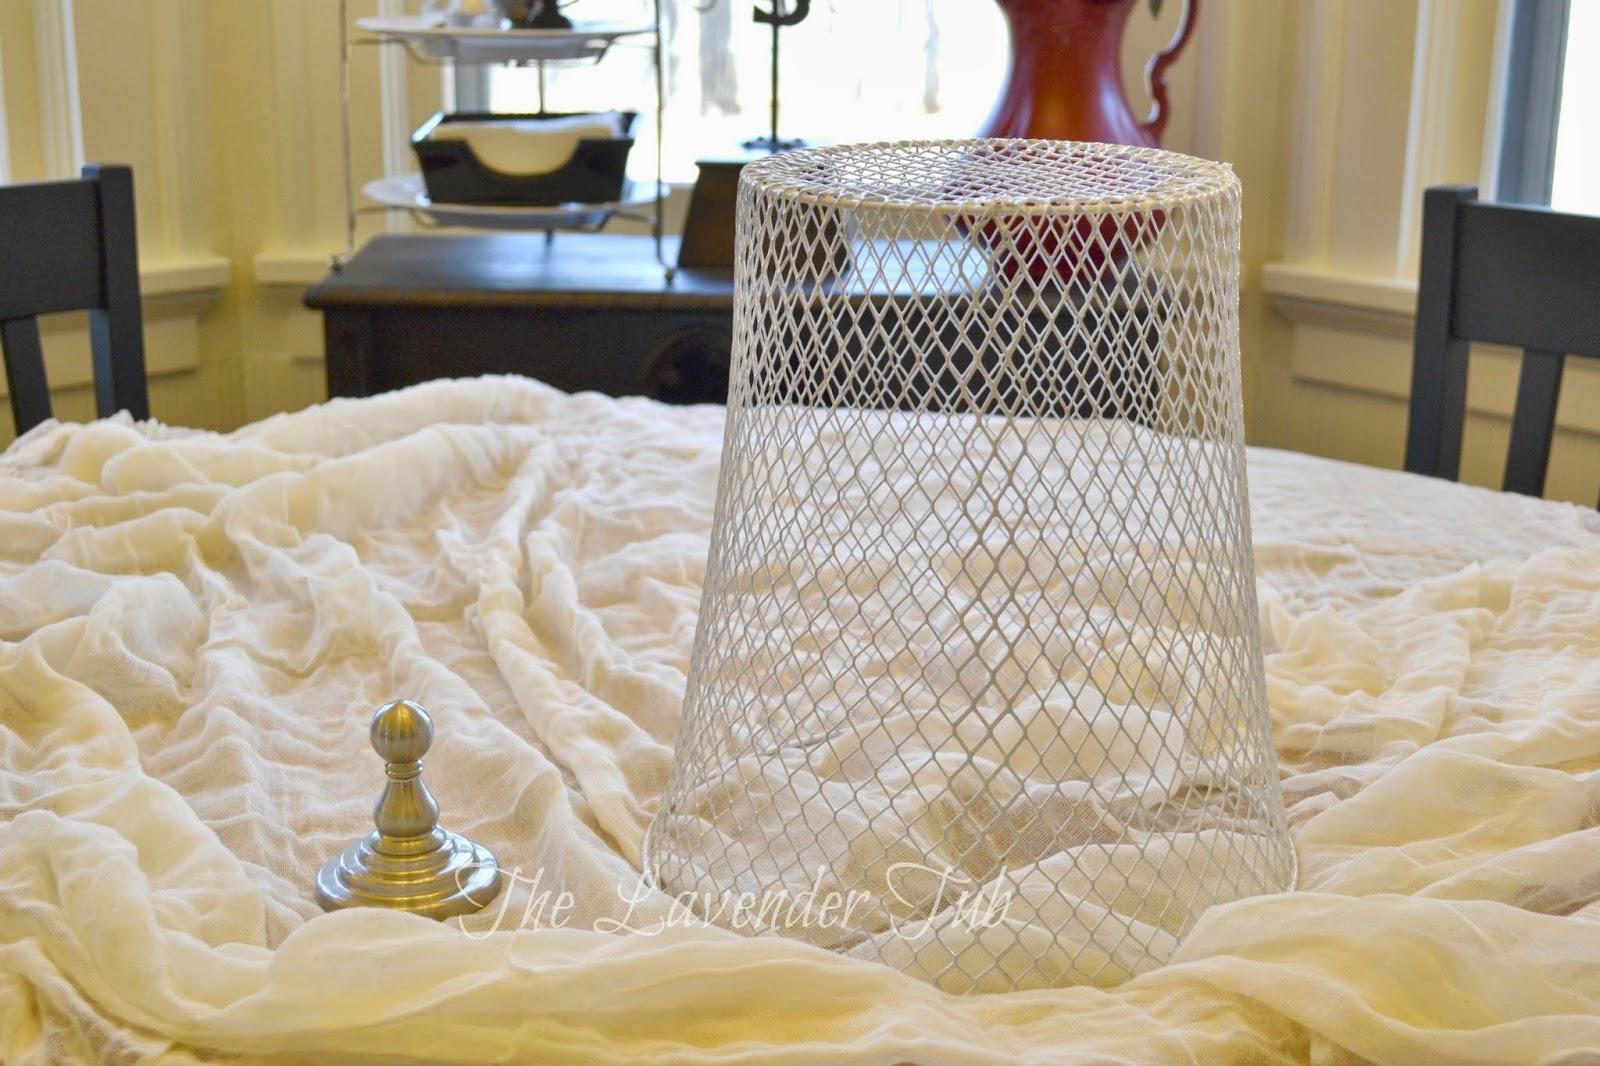 Wire Waste Basket the lavender tub: fast, fun, & fabulous - wire cloche